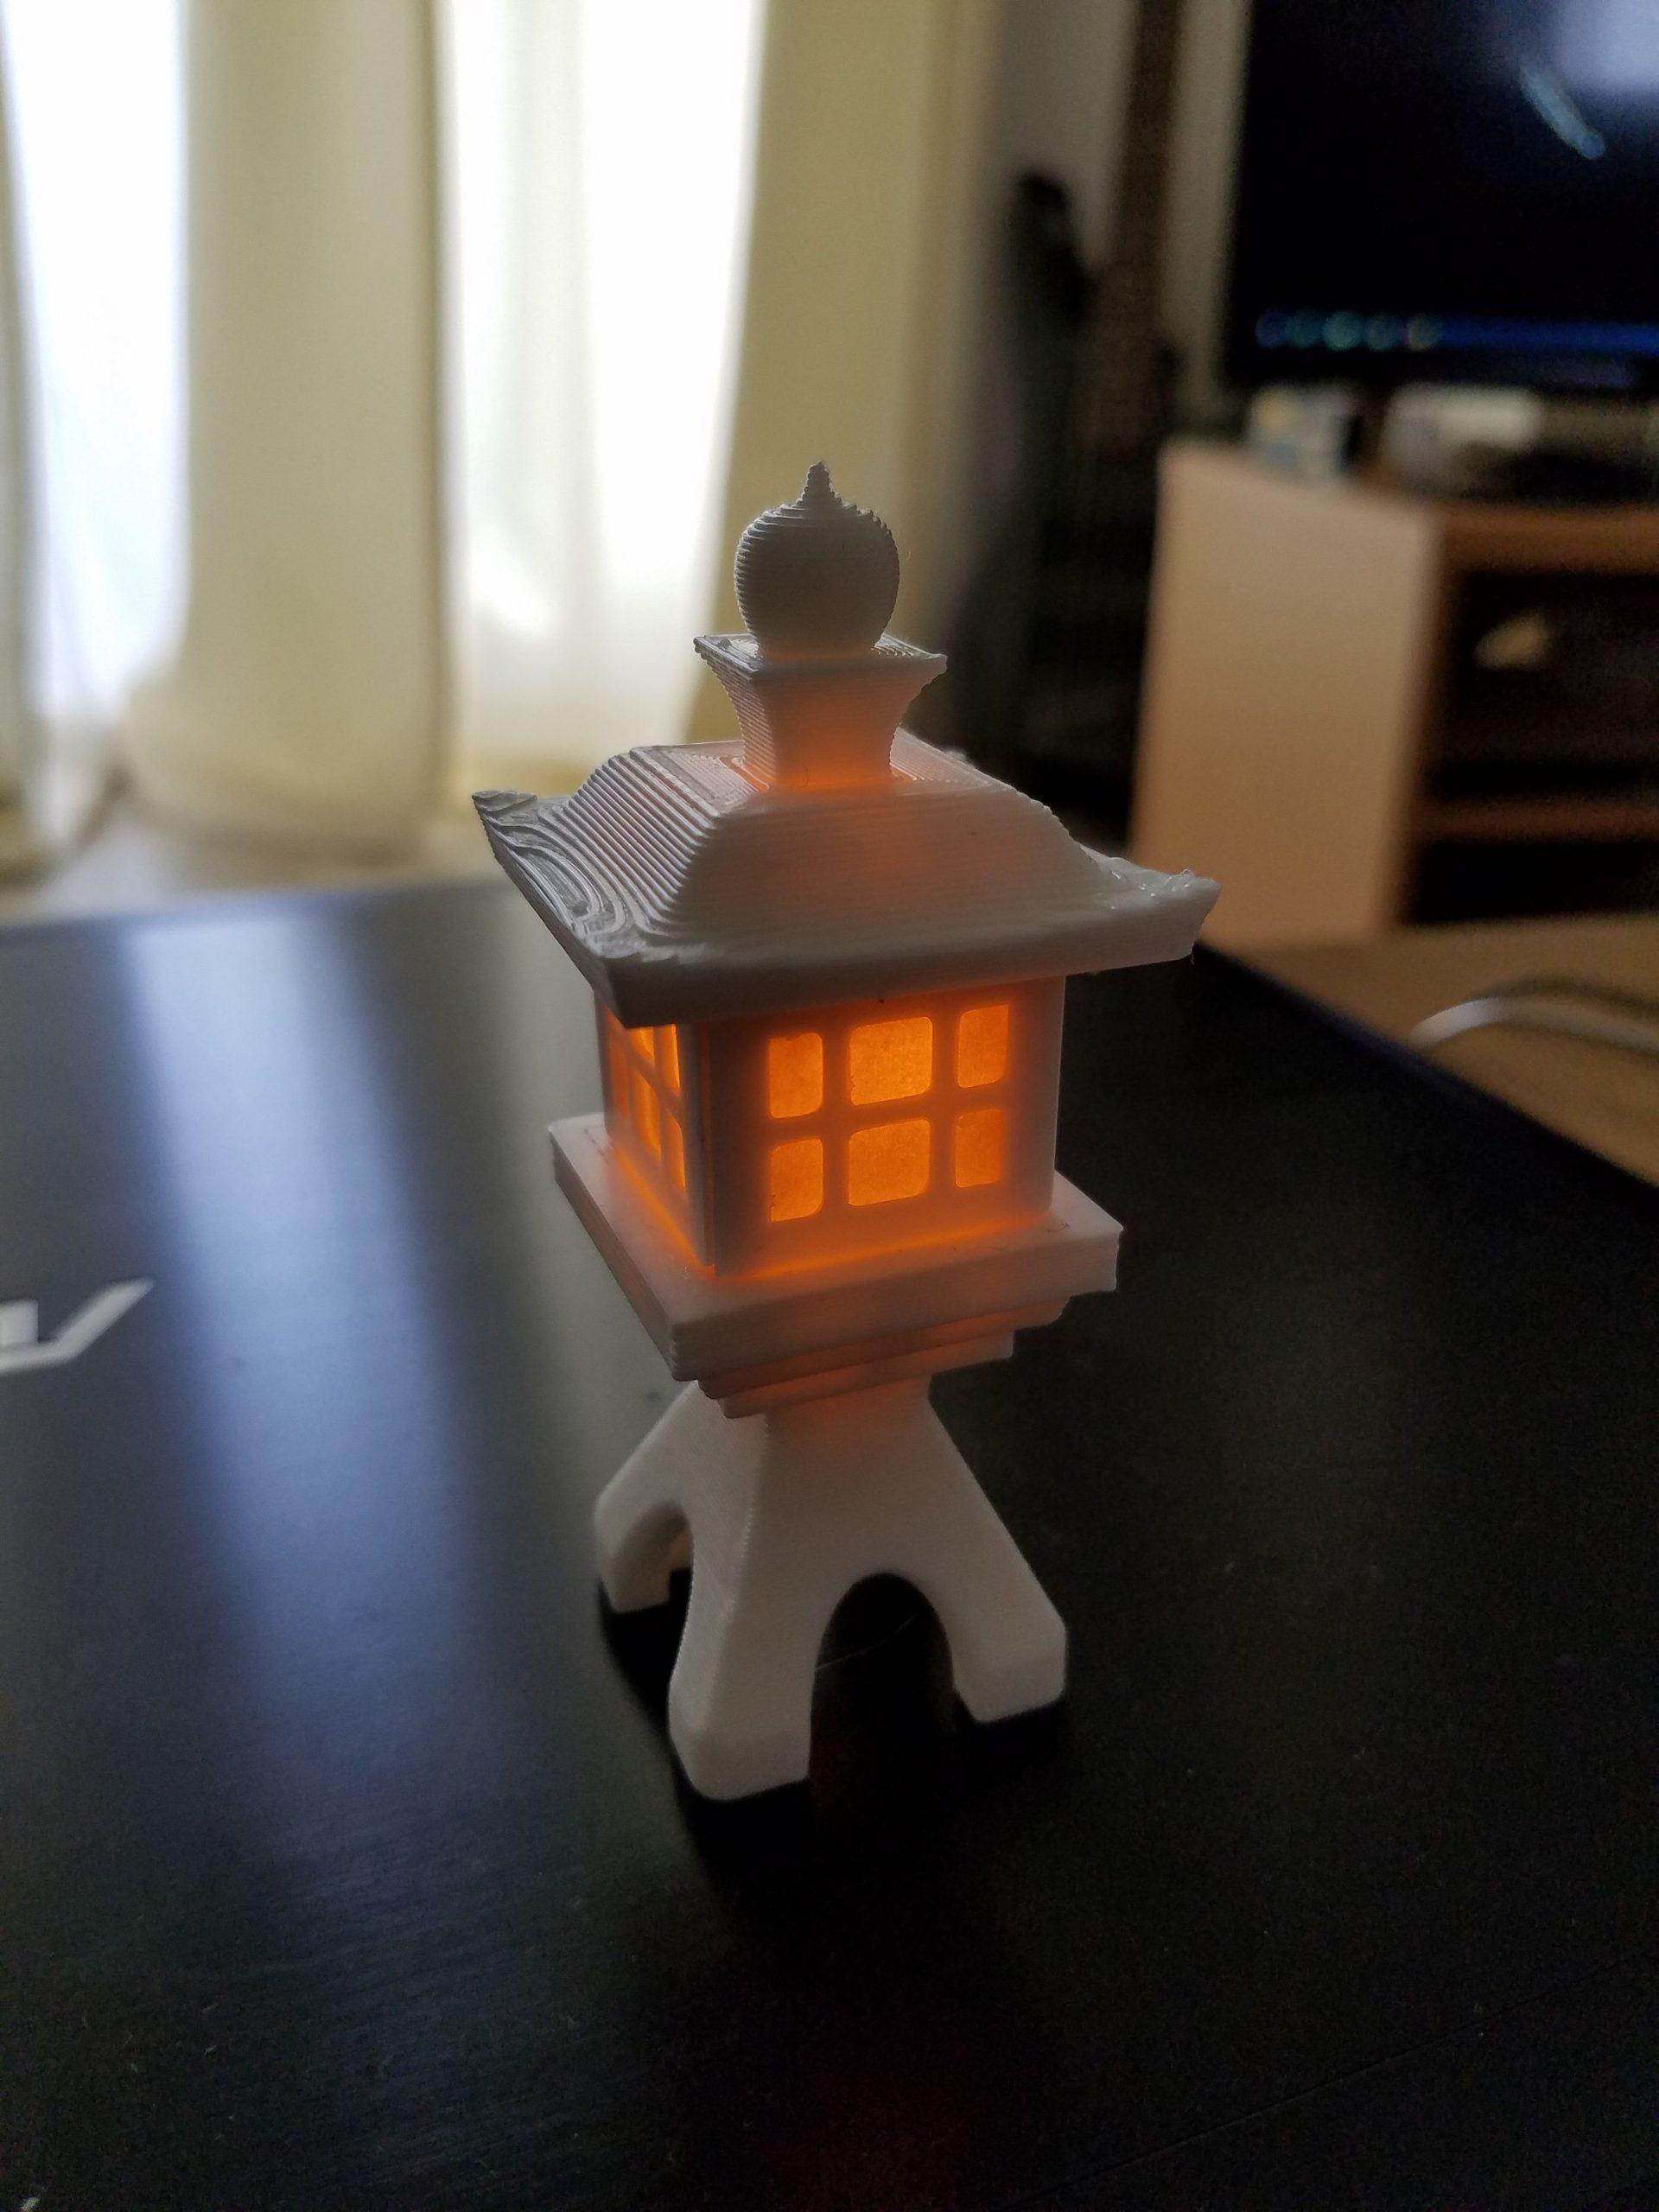 Lanterne Japonaise - Tōrō 灯籠 | Lanterne, Lanterne ... à Lanterne Japonaise Pas Cher